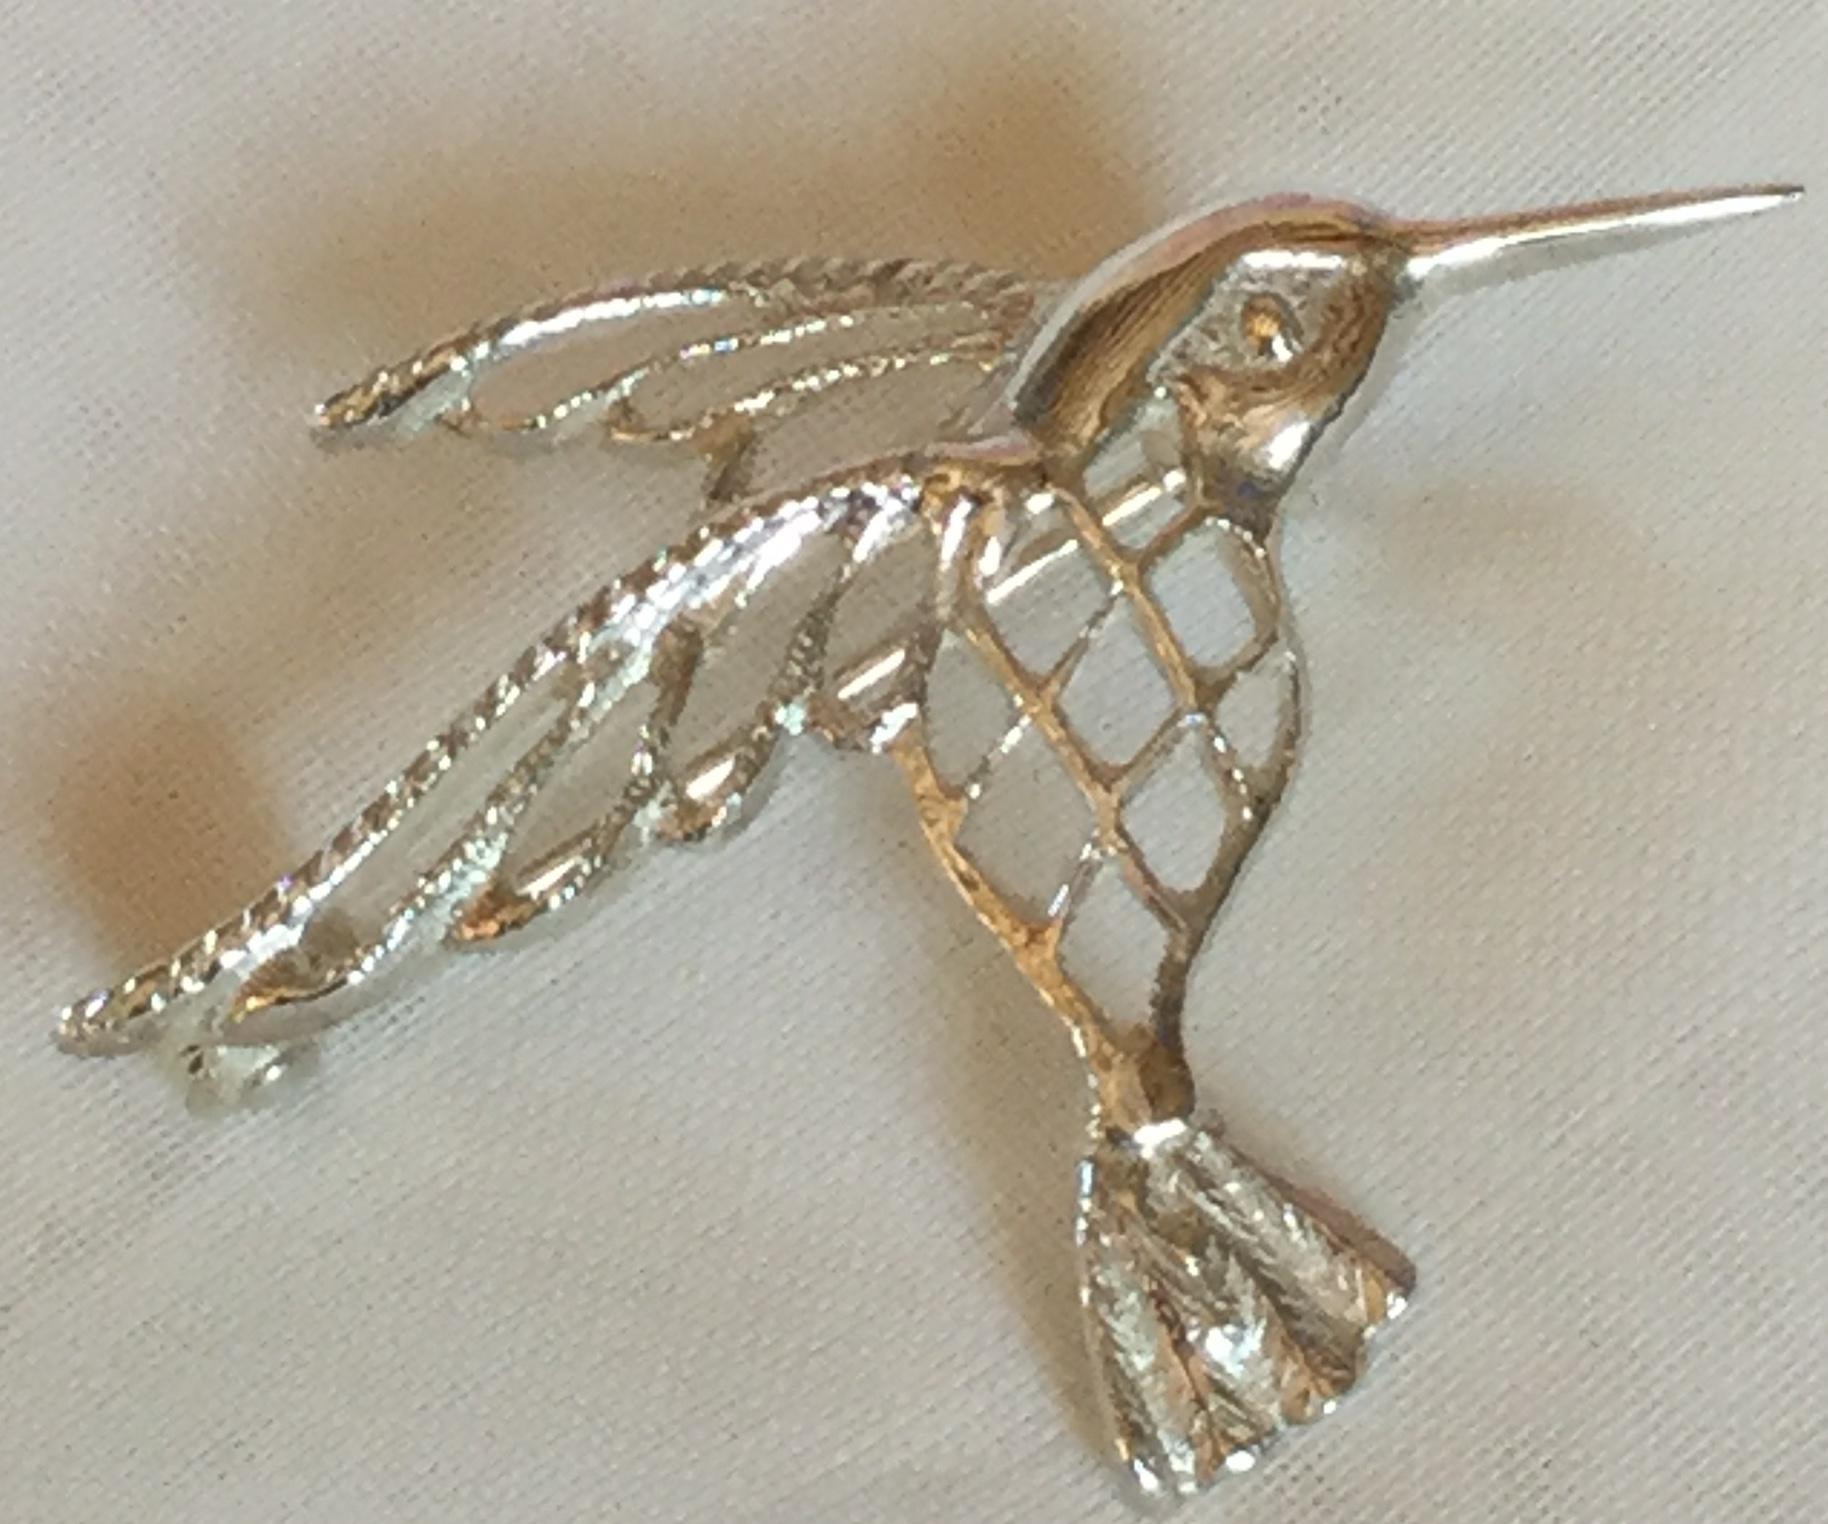 Lot 7 - Maltese Vintage Bird Brooch 4.10 g Silver 4 Cm x 3 Cm